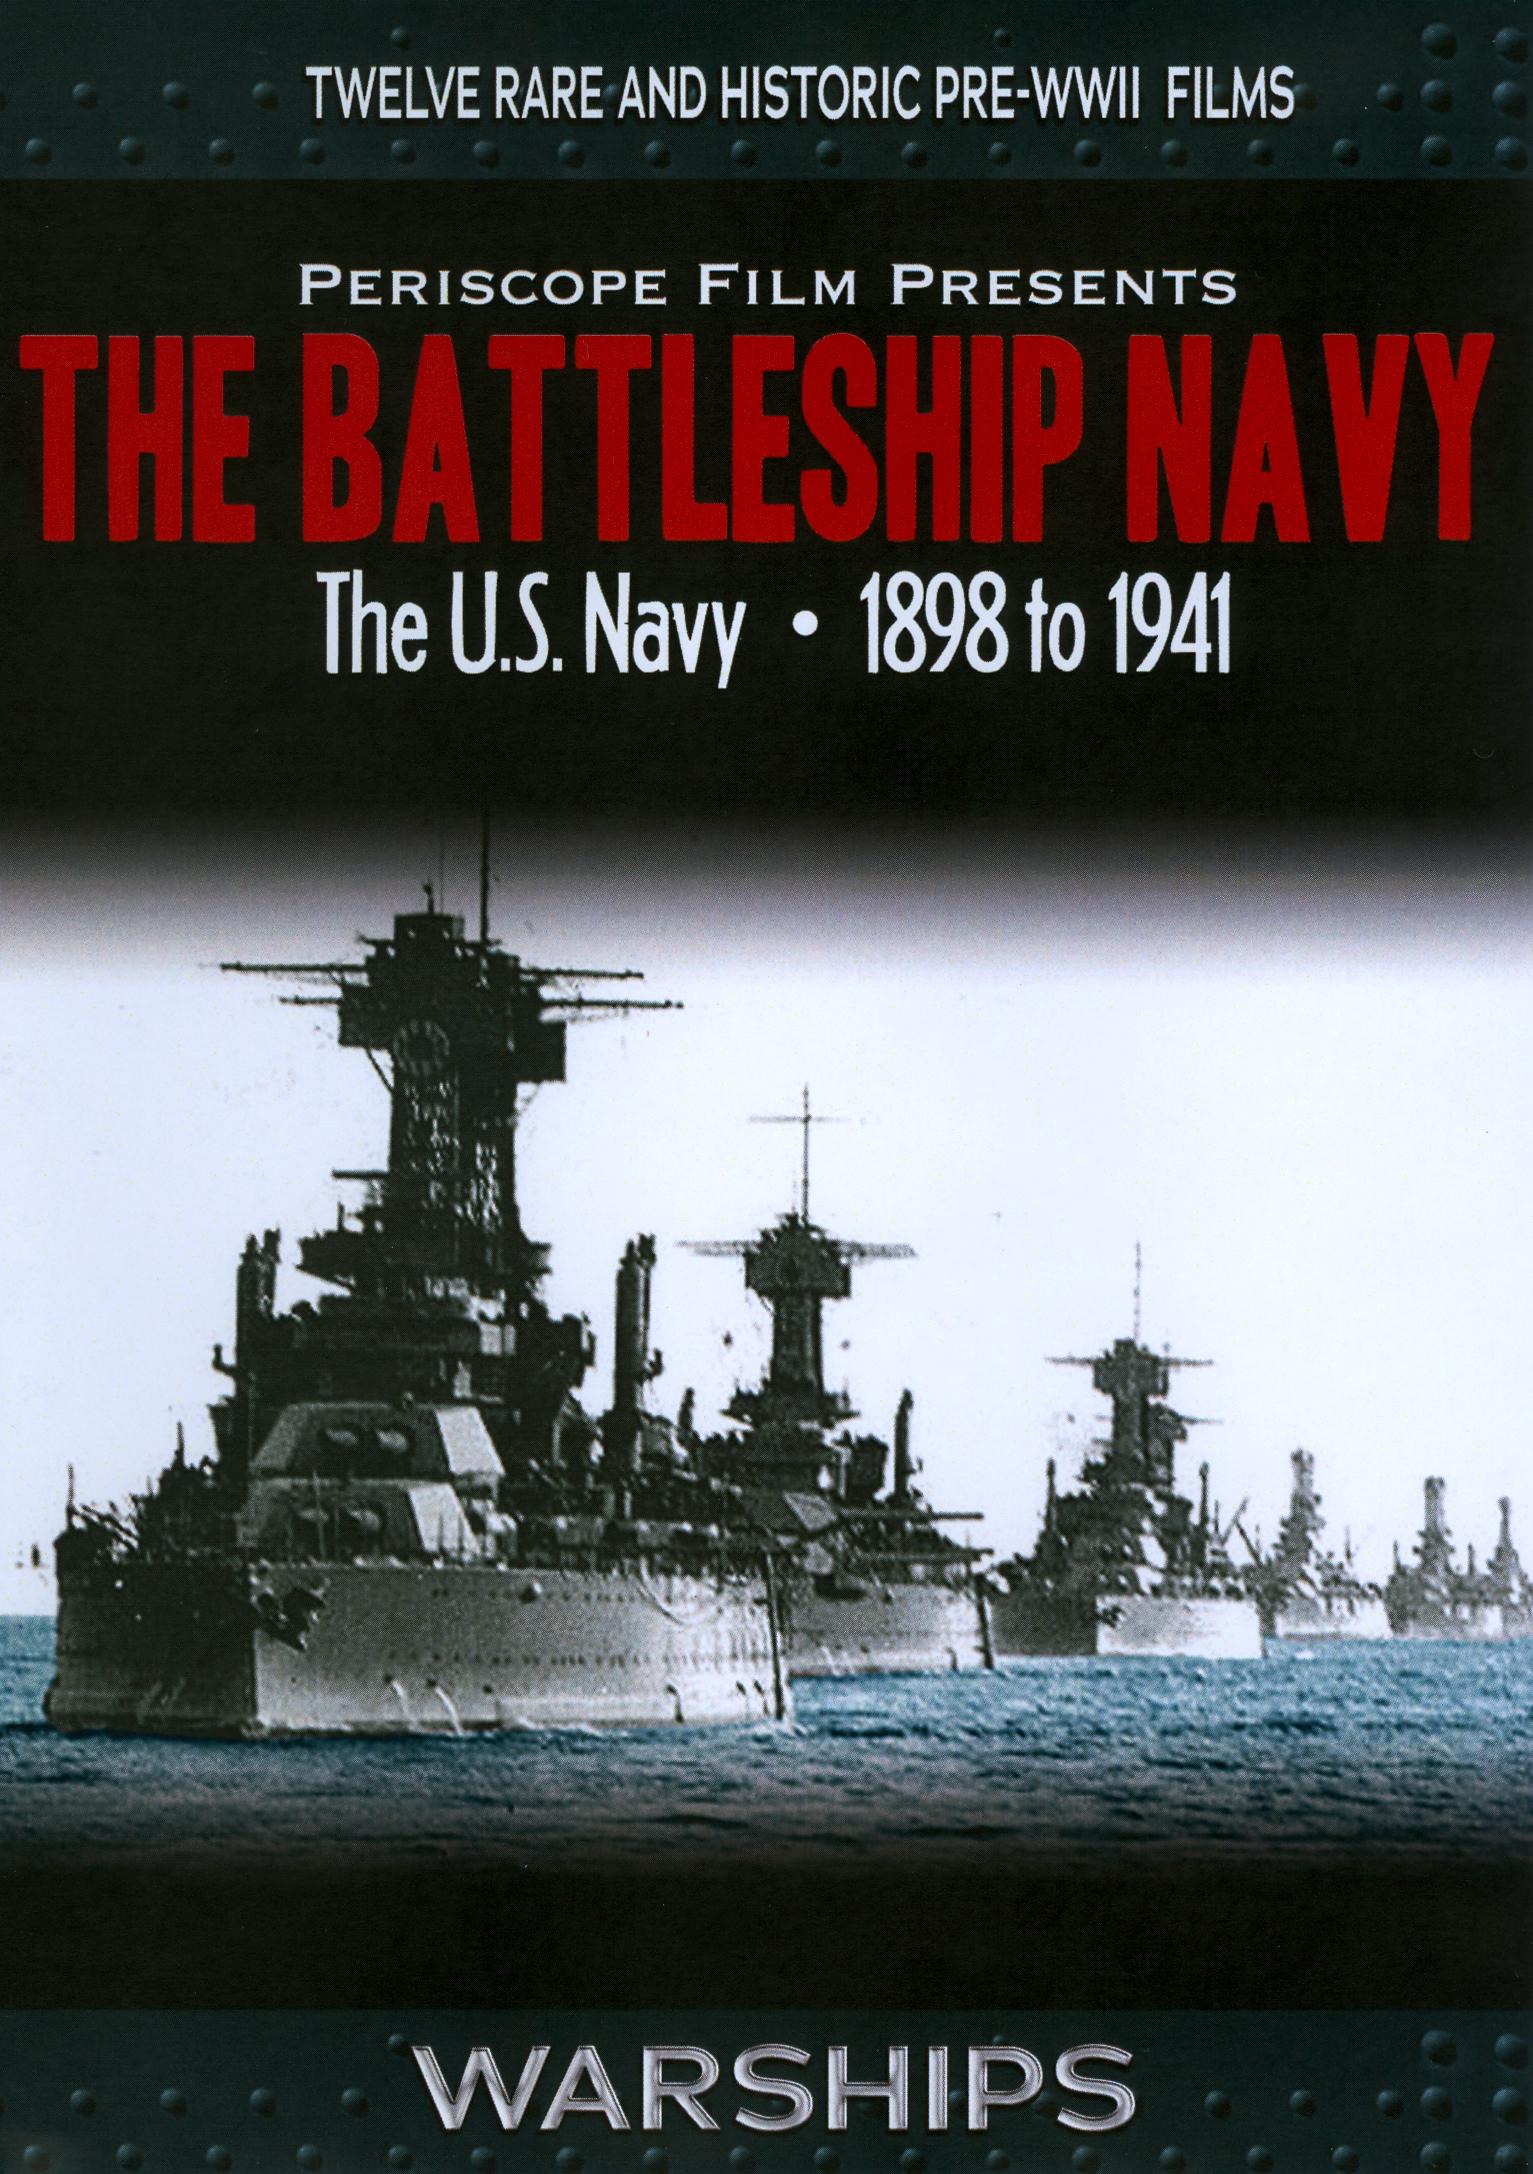 Battleship Navy: The U.S. Navy: 1898 To 1941